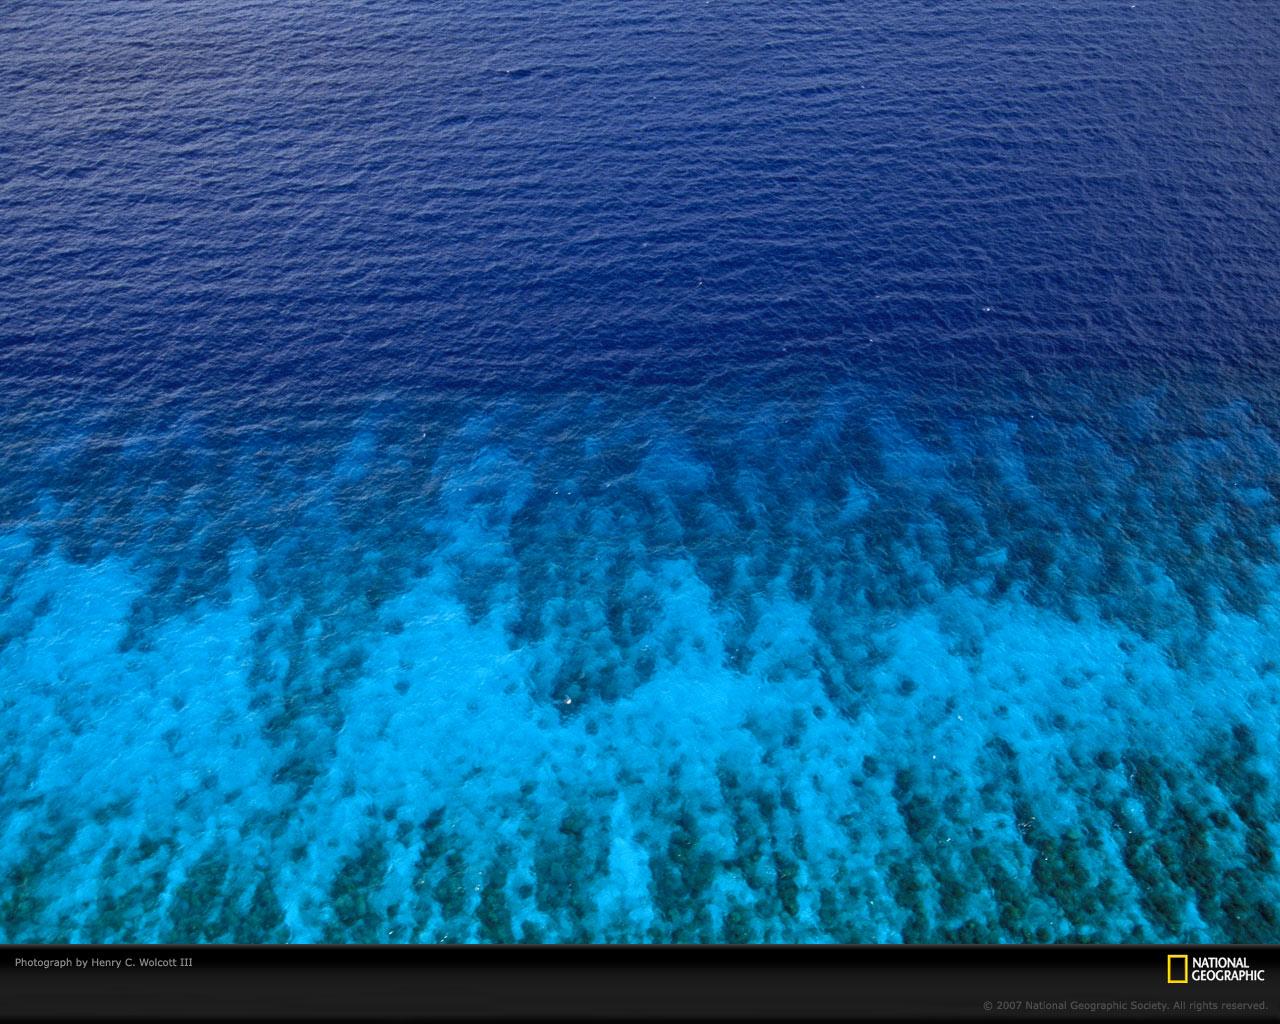 Mer Bleu Des Caraibes 10 000 Fonds D Ecran Hd Gratuits Et De Qualite Wallpapers Hd